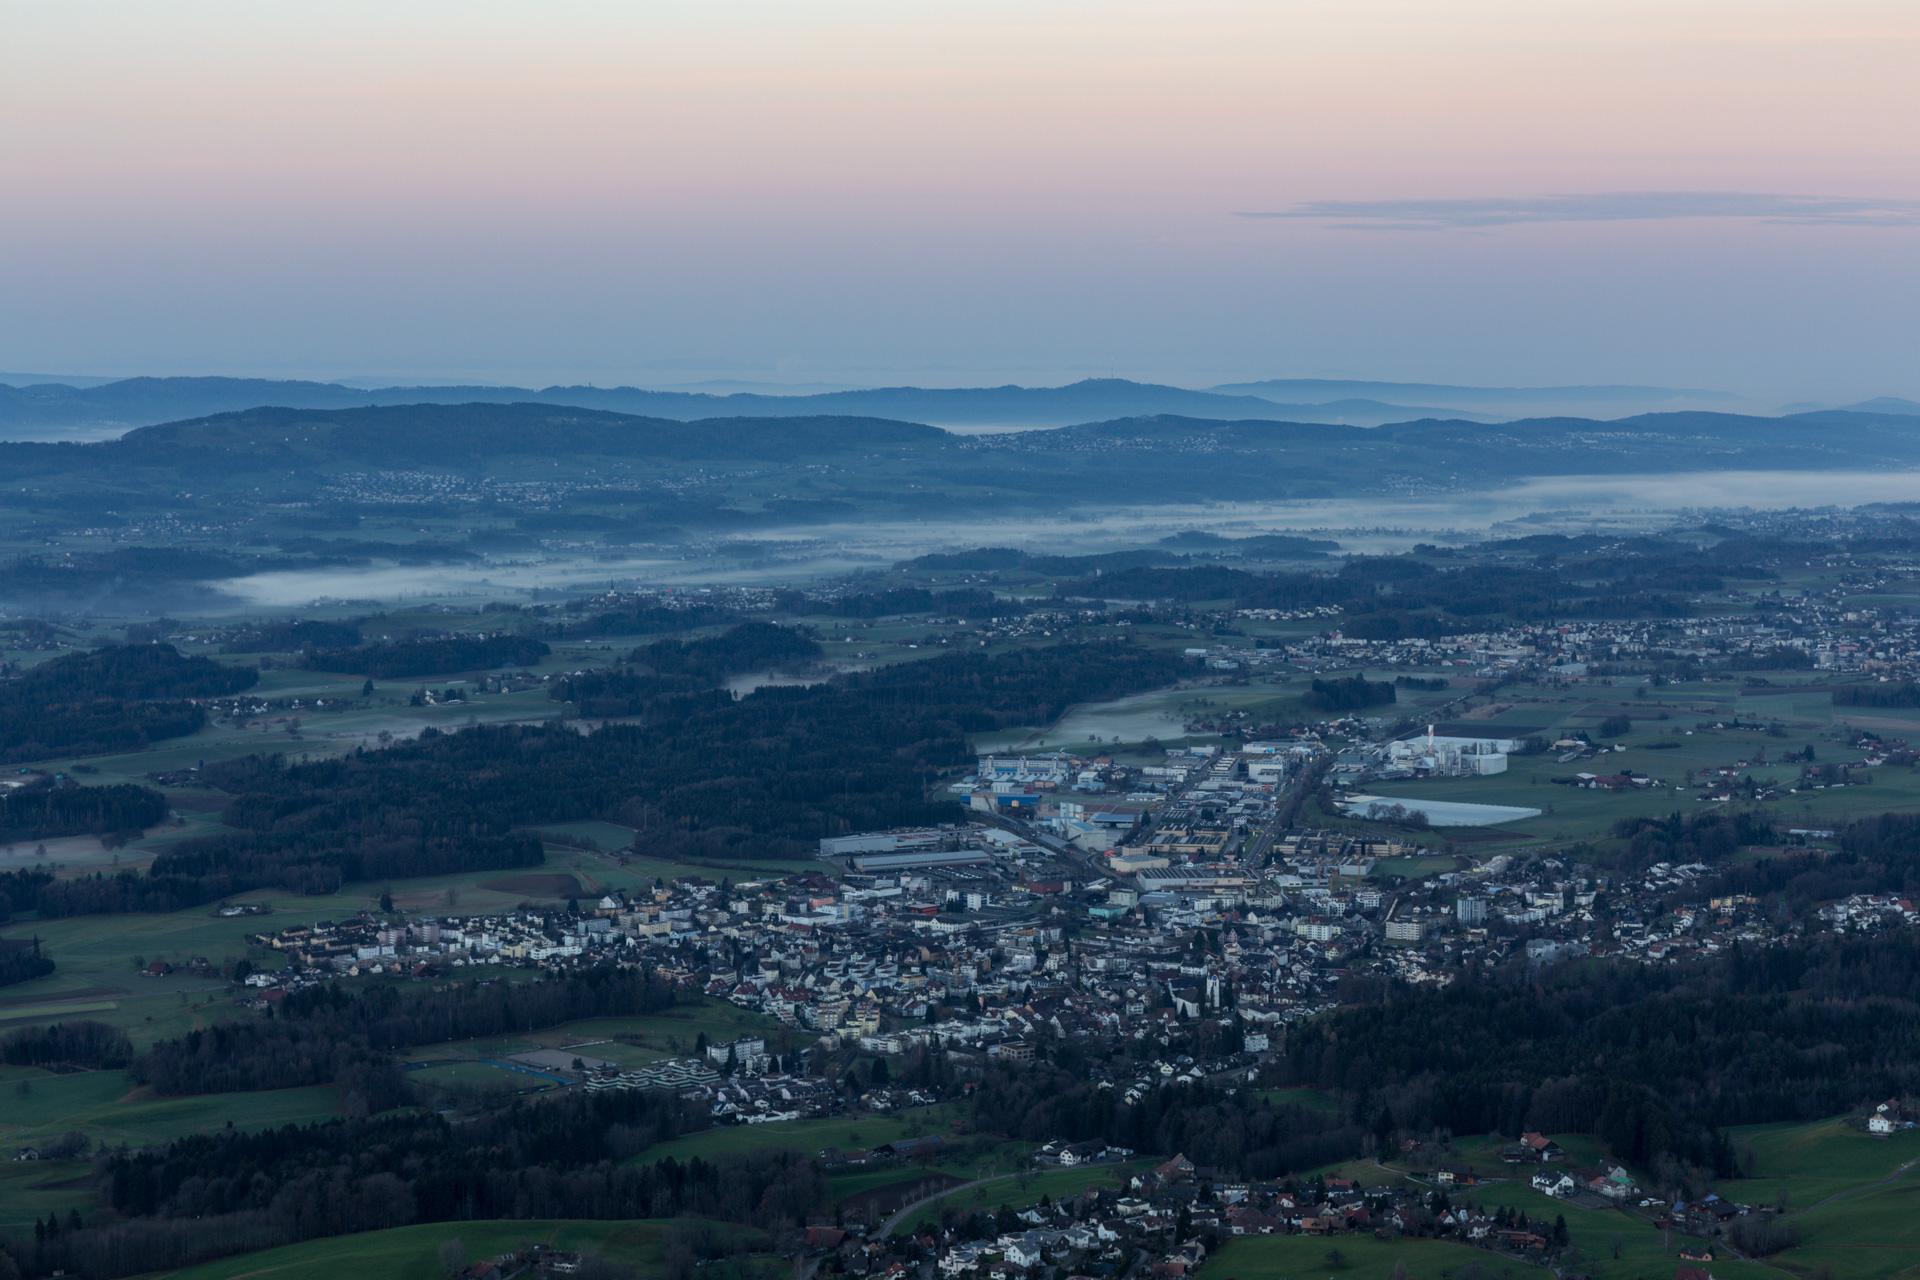 Sonnenaufgang-Bachtelturm_20151219_5926-1